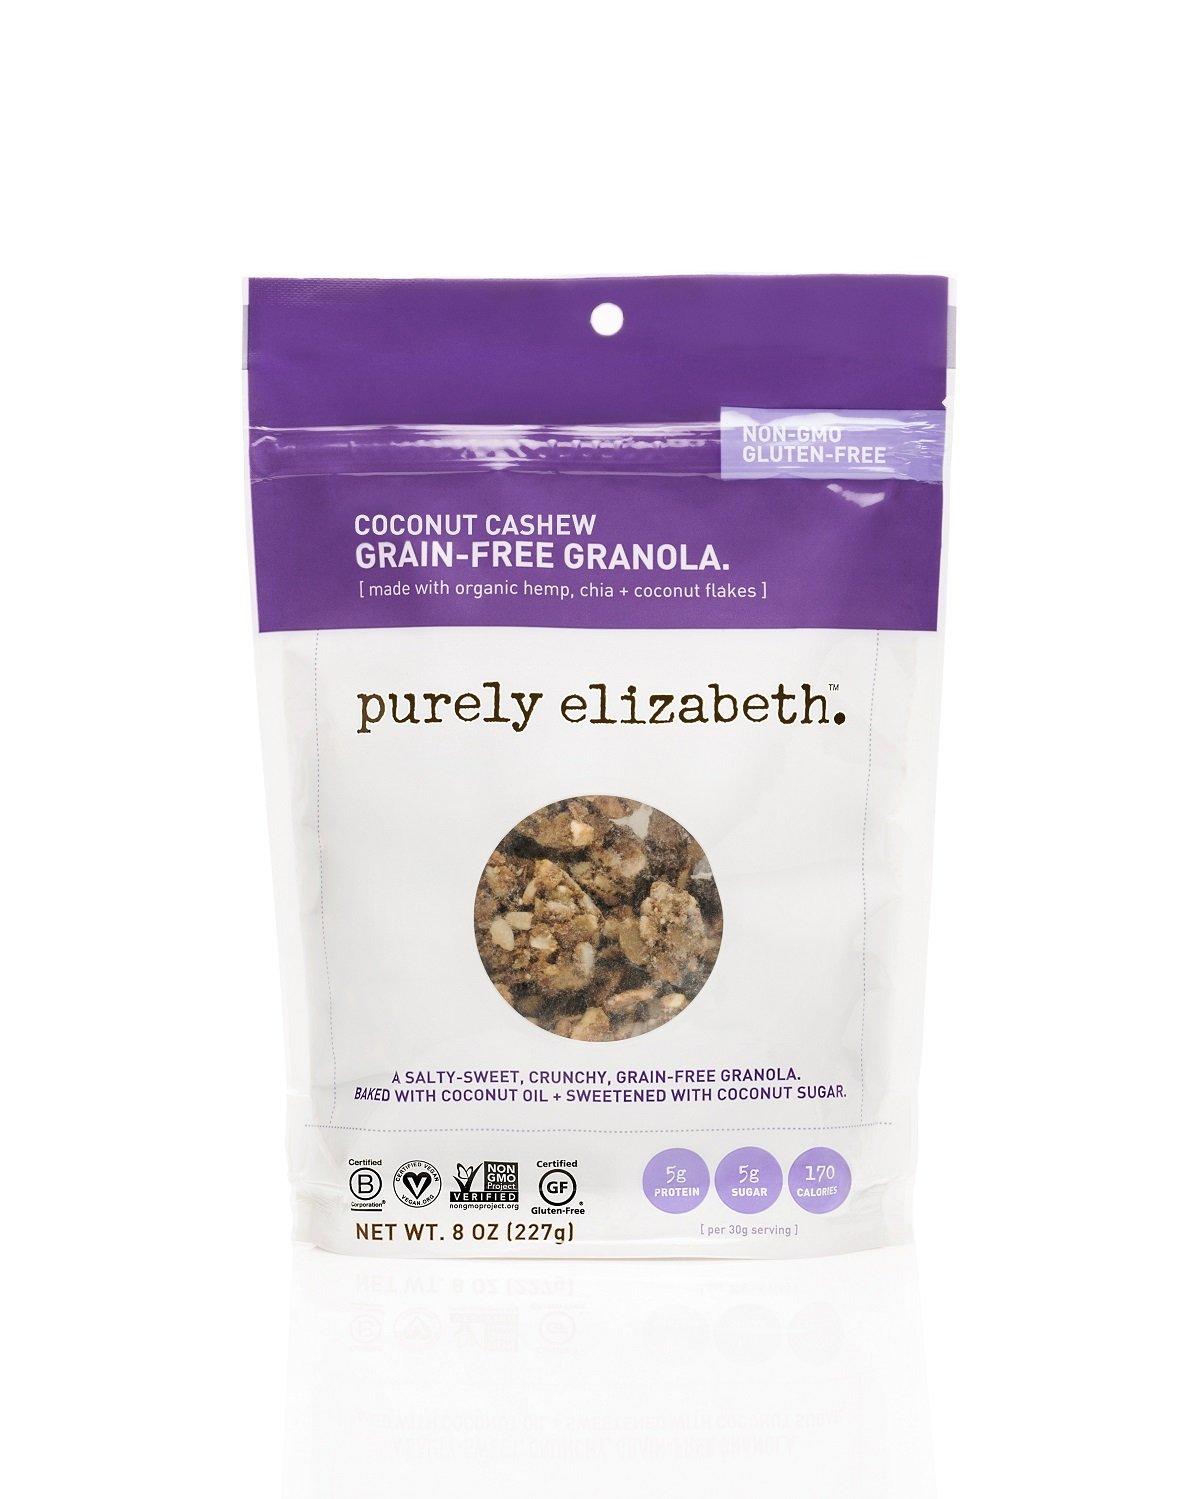 purely elizabeth Coconut Cashew Grain-Free & Gluten Free Granola, 0.5 Pound